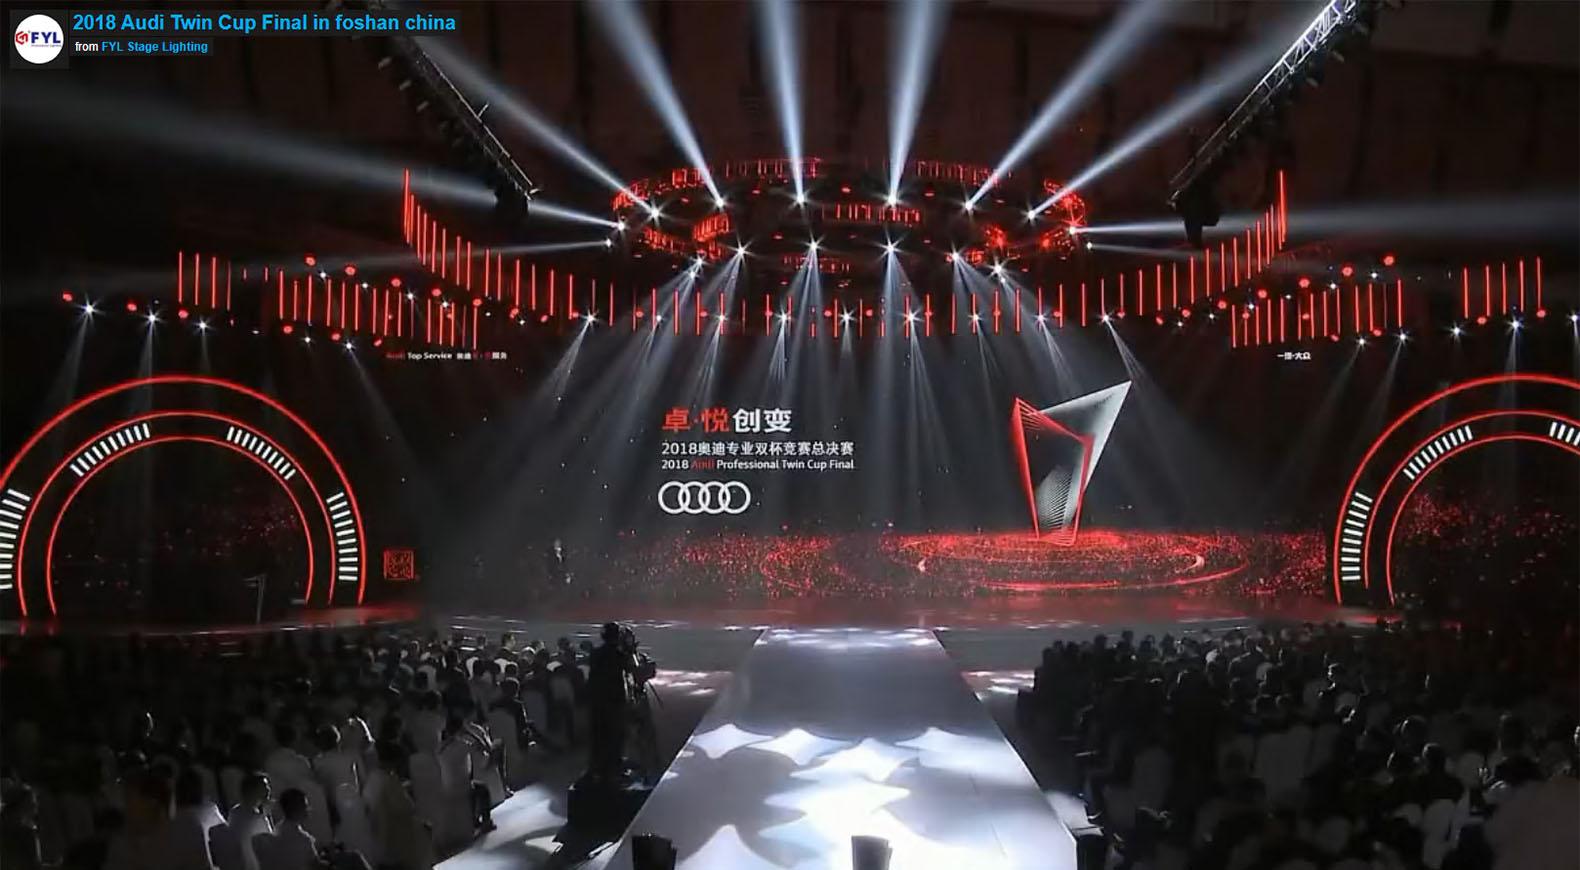 2018 Audi Twin Cup Final in Foshan China